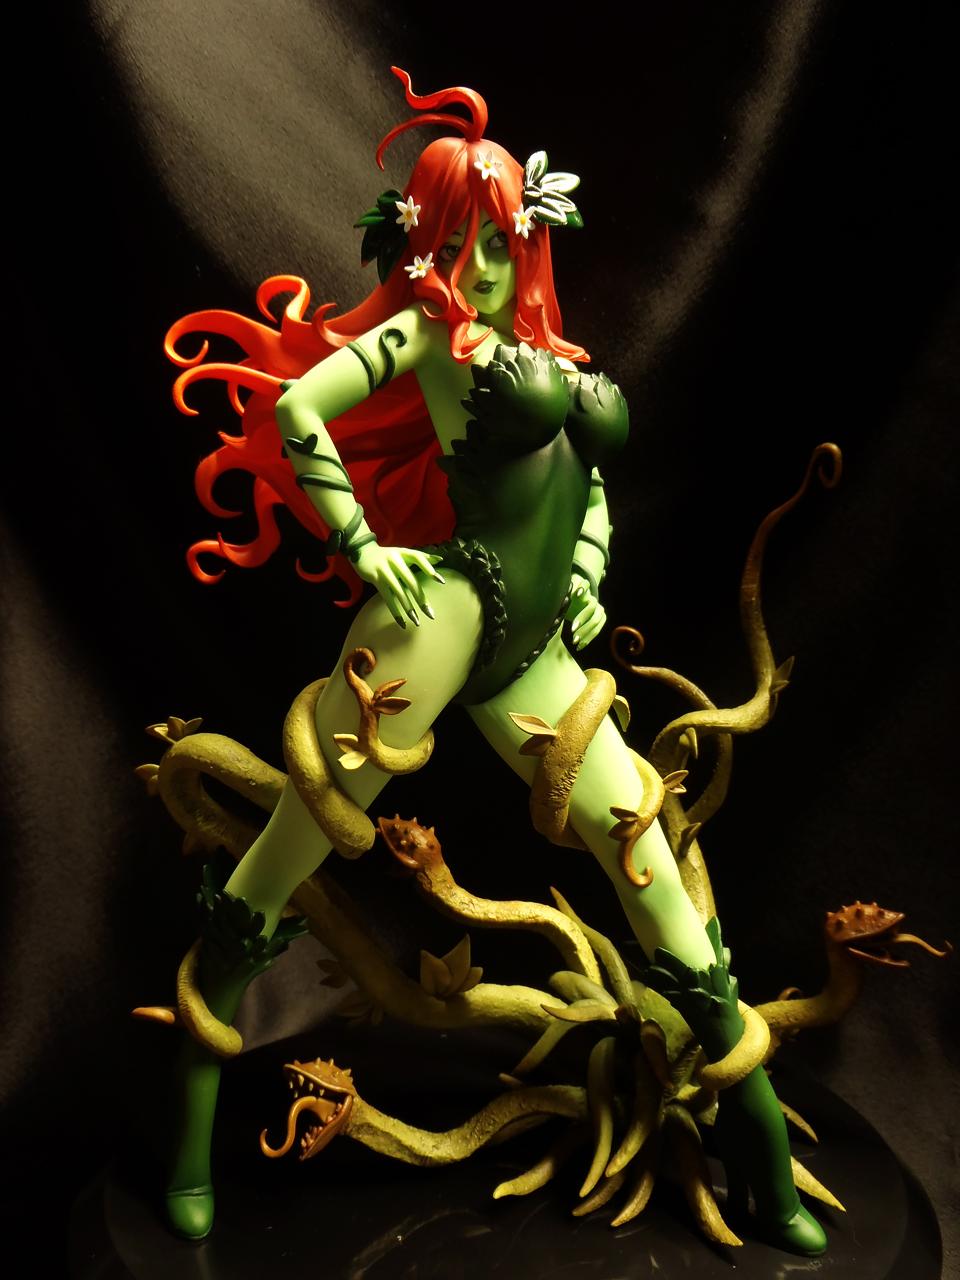 Poison Ivy by DeathShadowSun